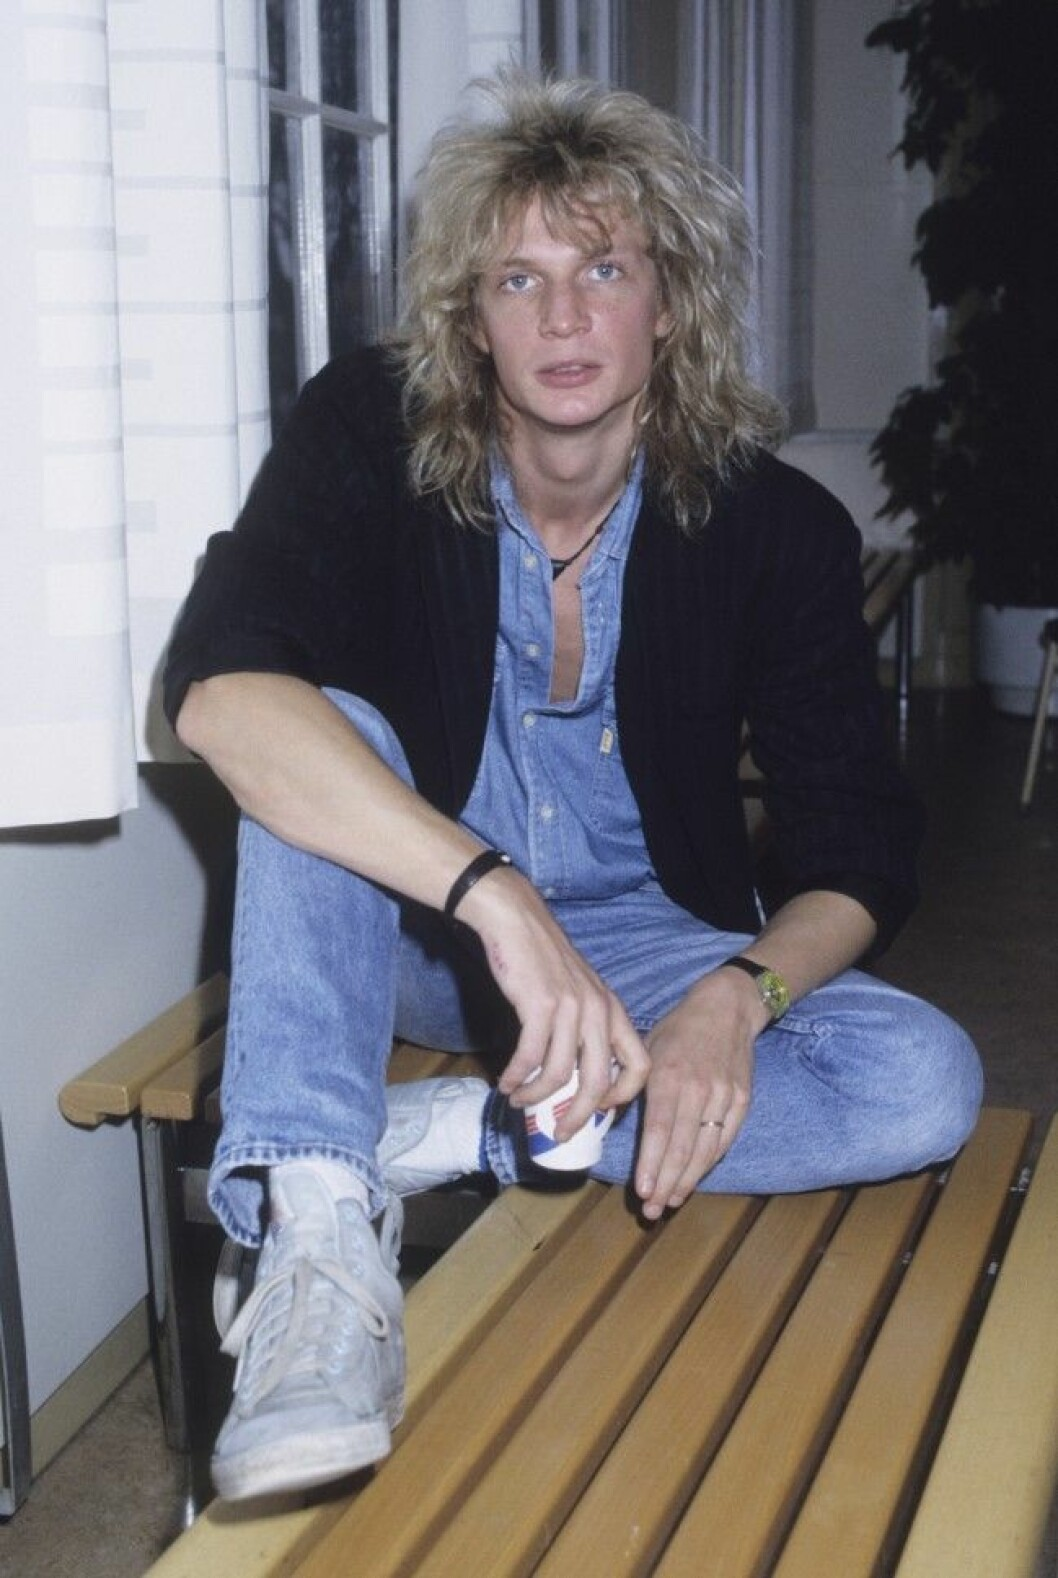 Tommy Nilsson sångare 1989 dia 3966